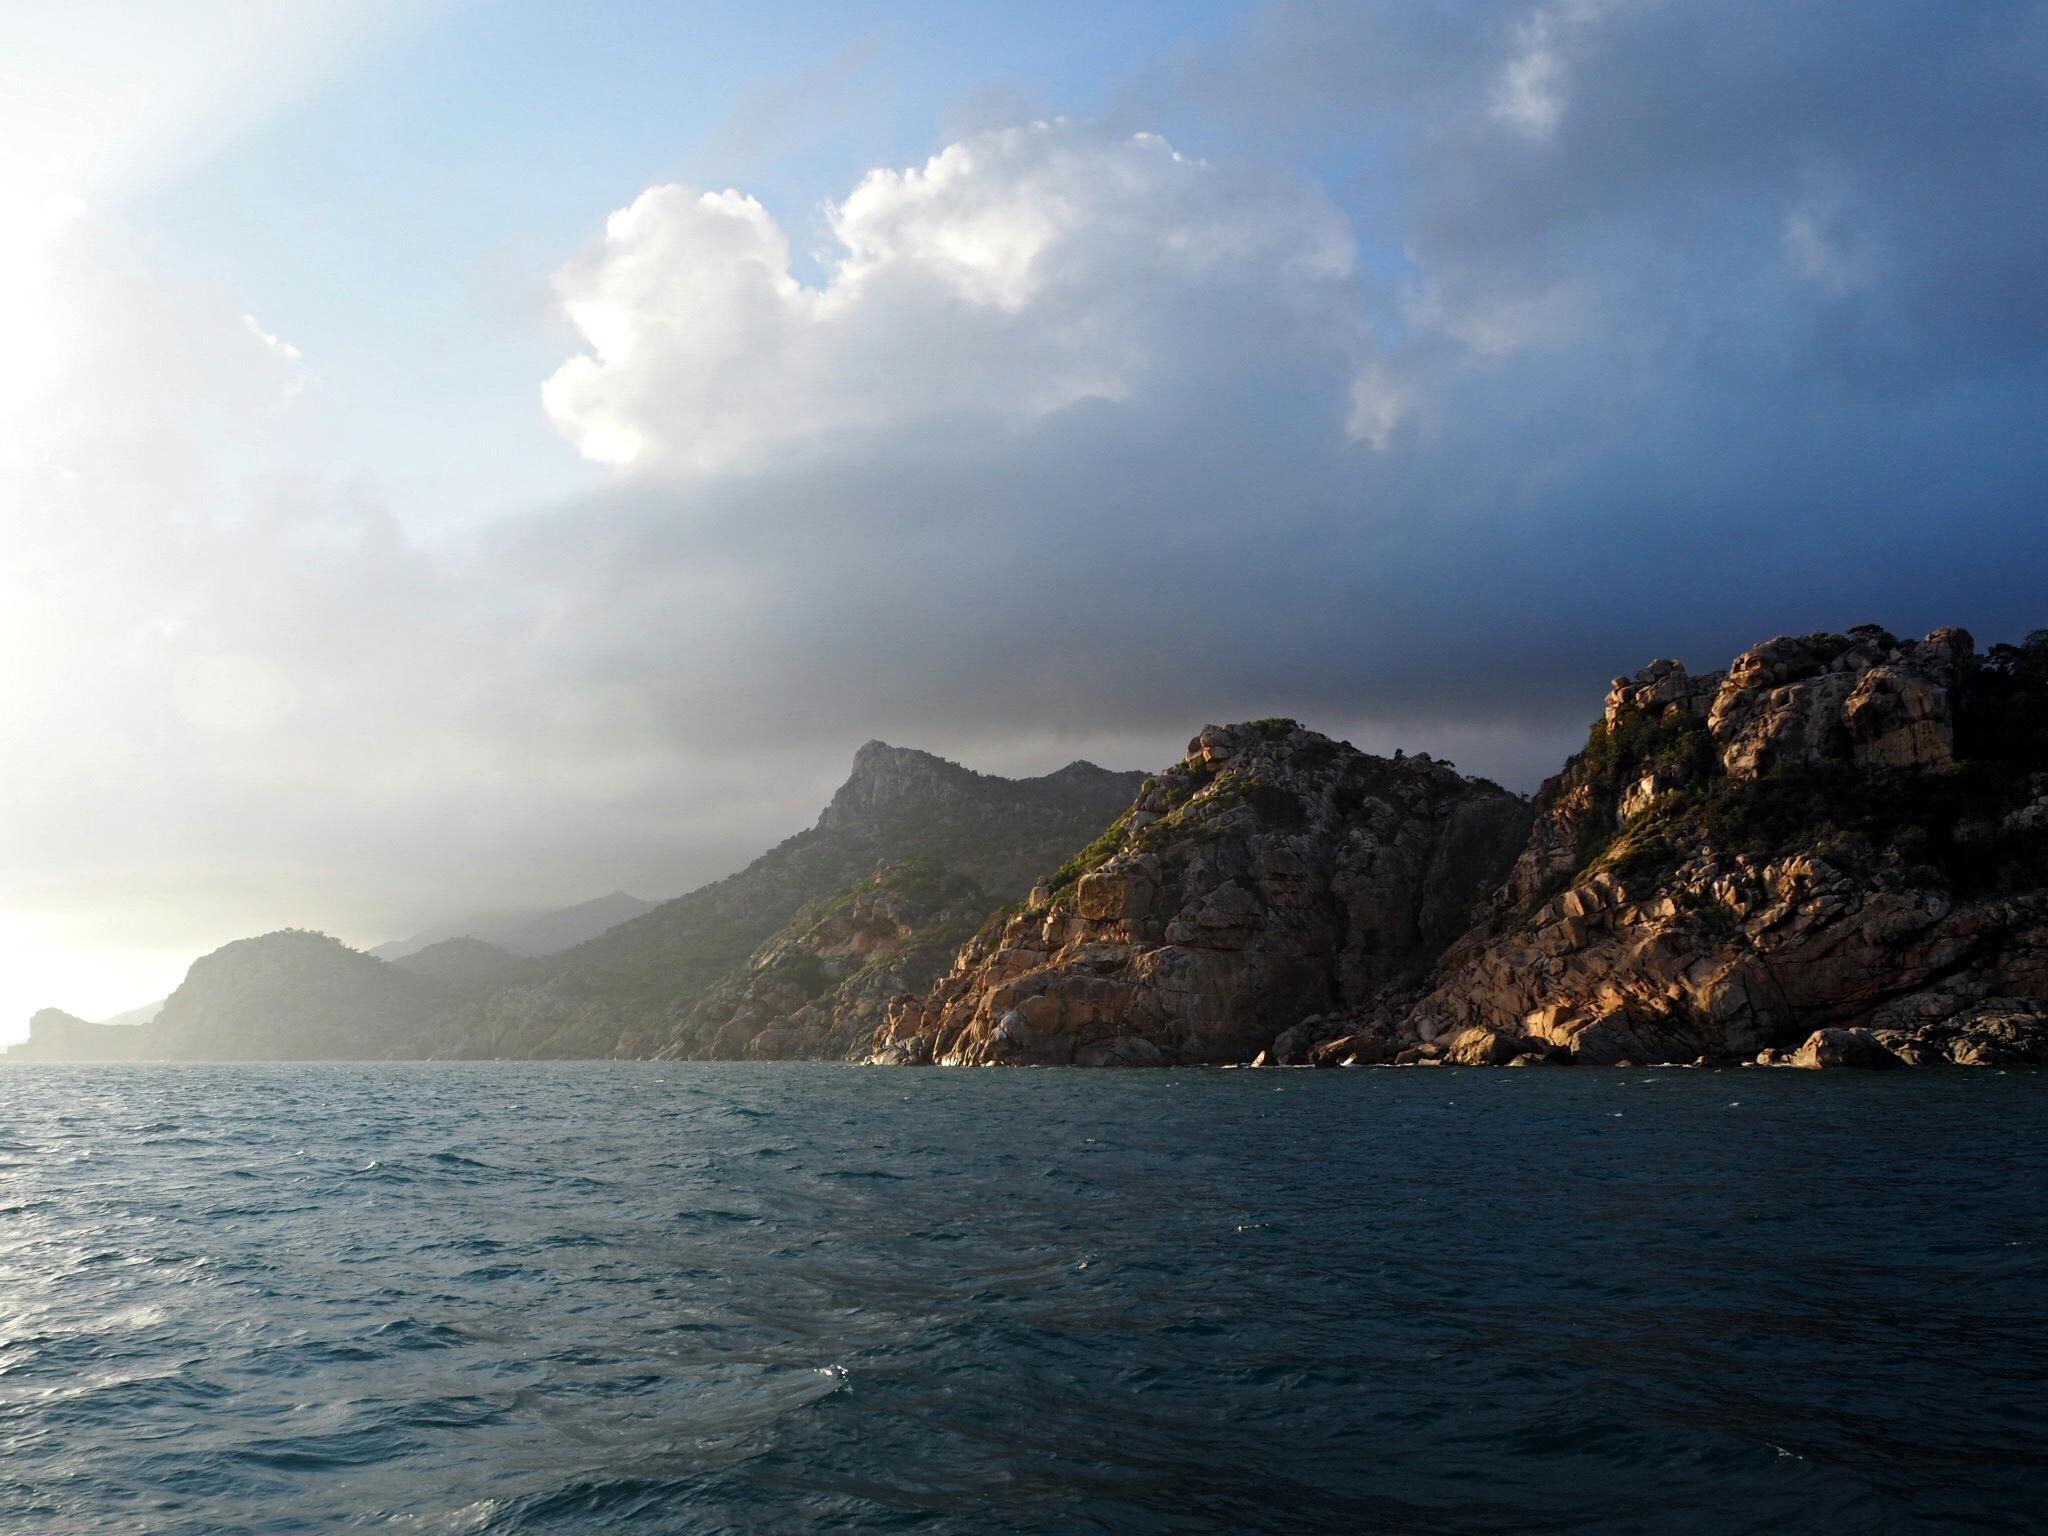 Leaving Cape Upstart this morning